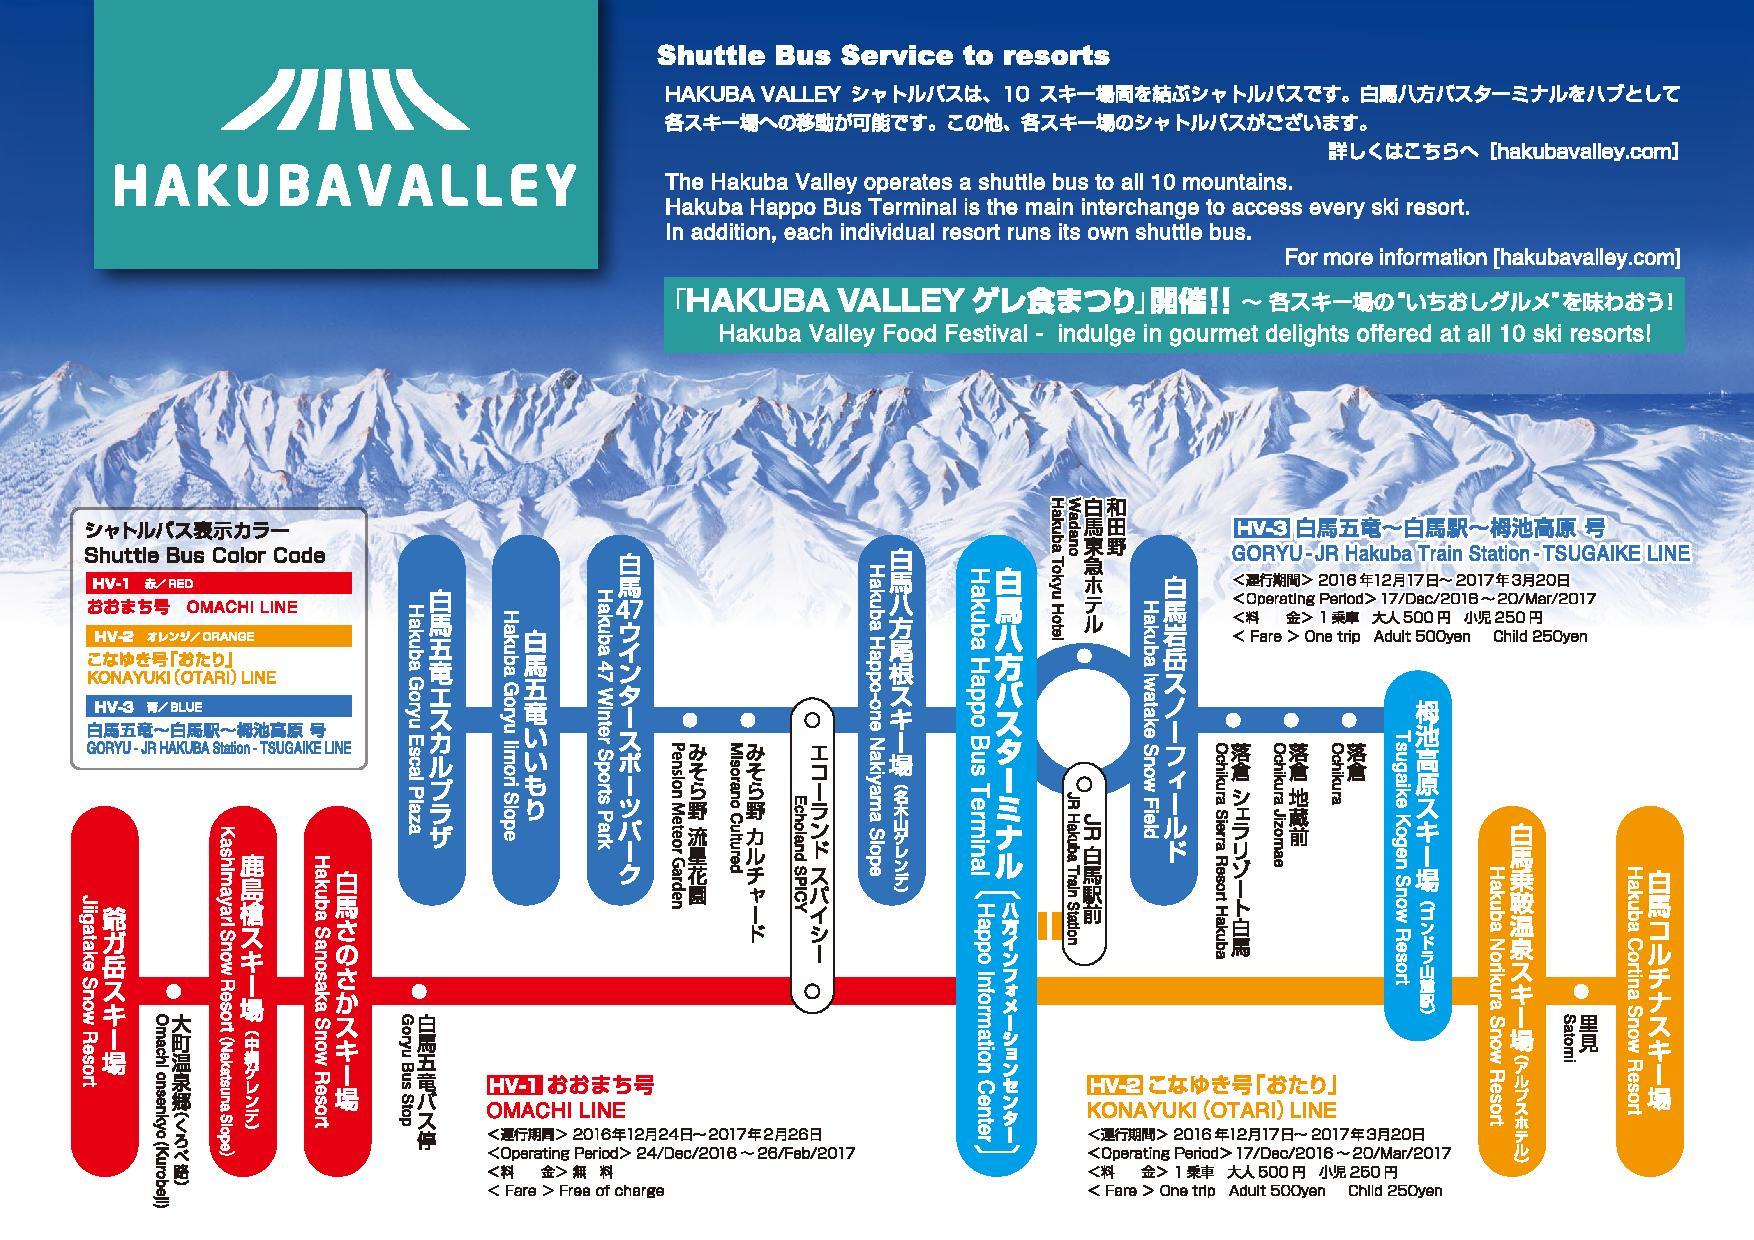 hakuba valley shuttle bus timetable